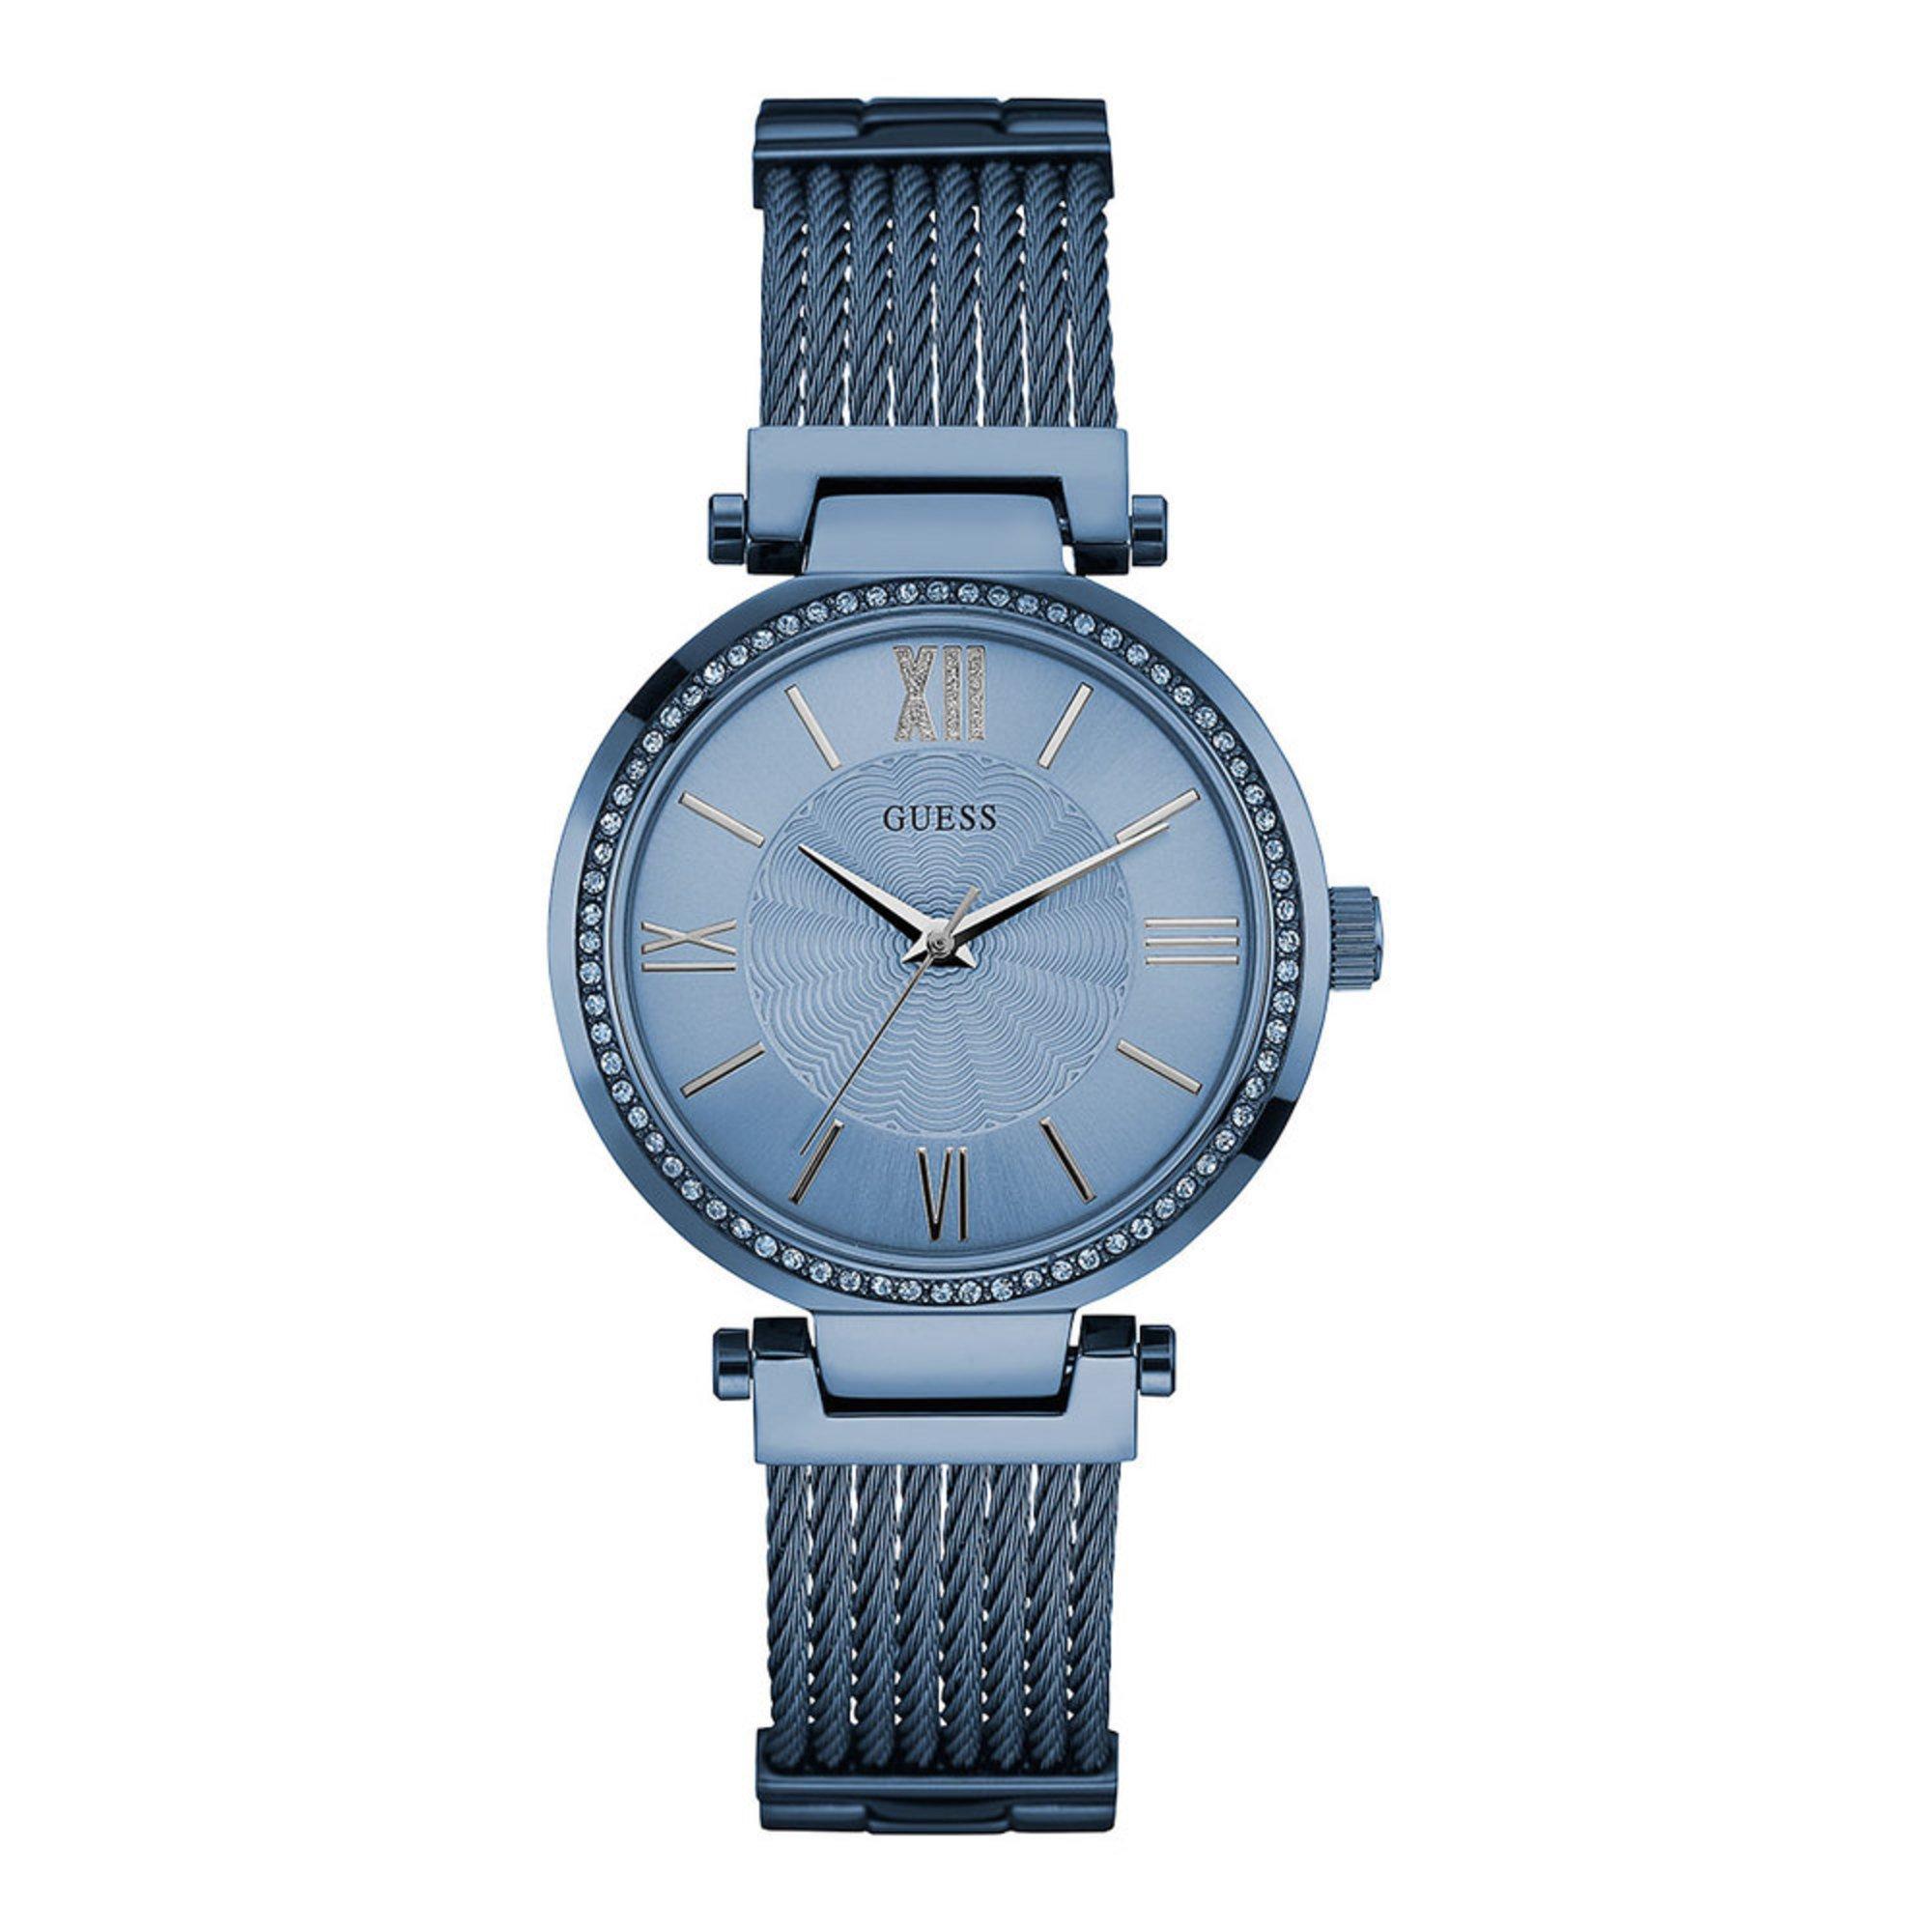 02e5c9aff401 Guess Women s Sky Blue Tone Stainless Steel Bracelet Watch